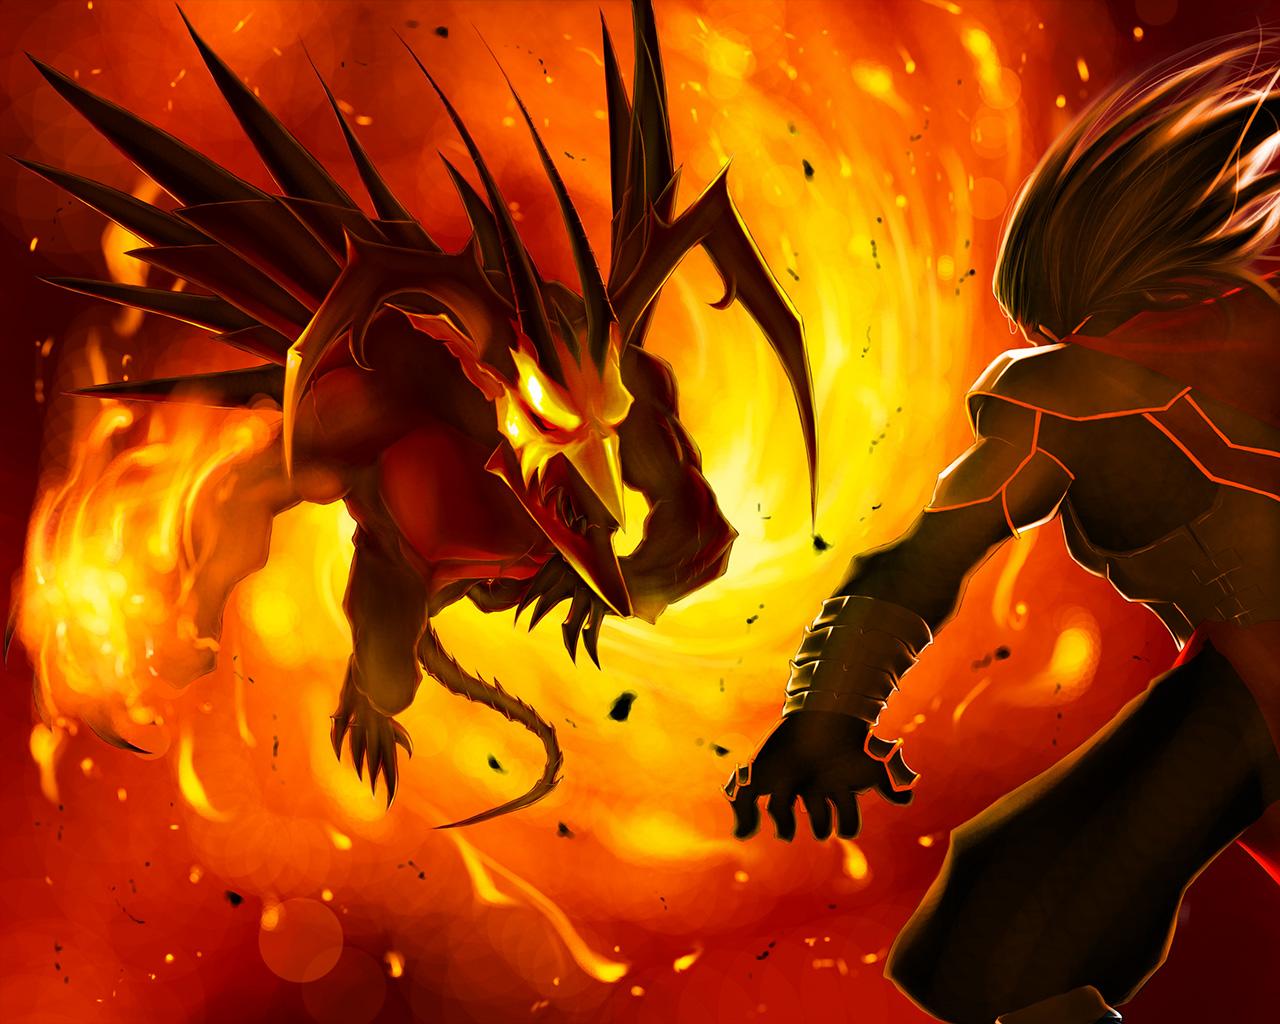 Inferno by AngelusMortis